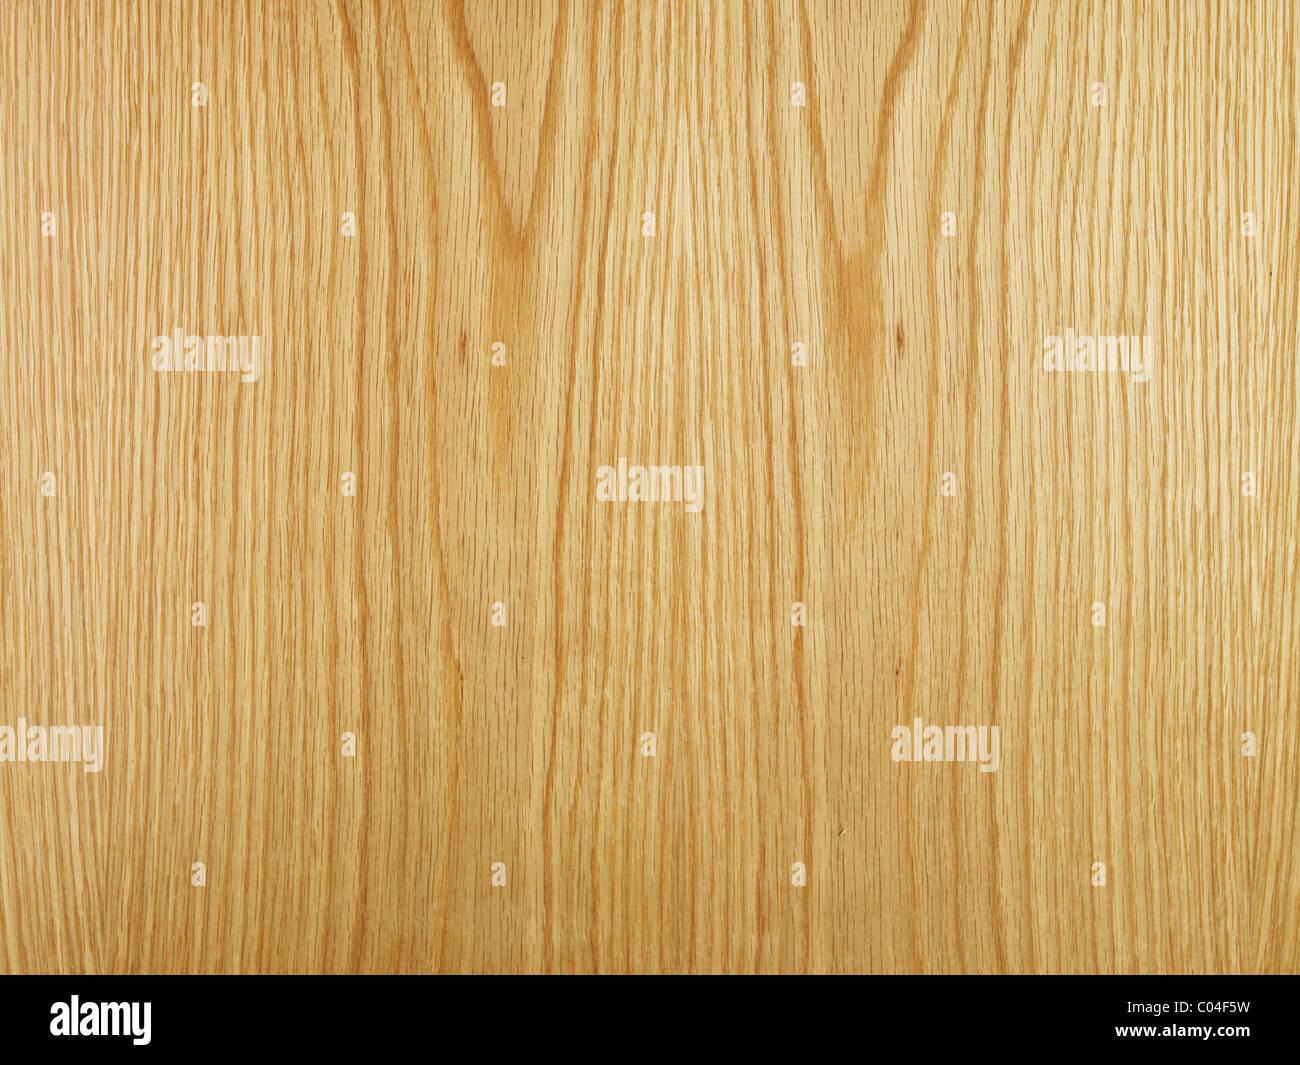 light oak wood grain table top stock photo 34520469 alamy